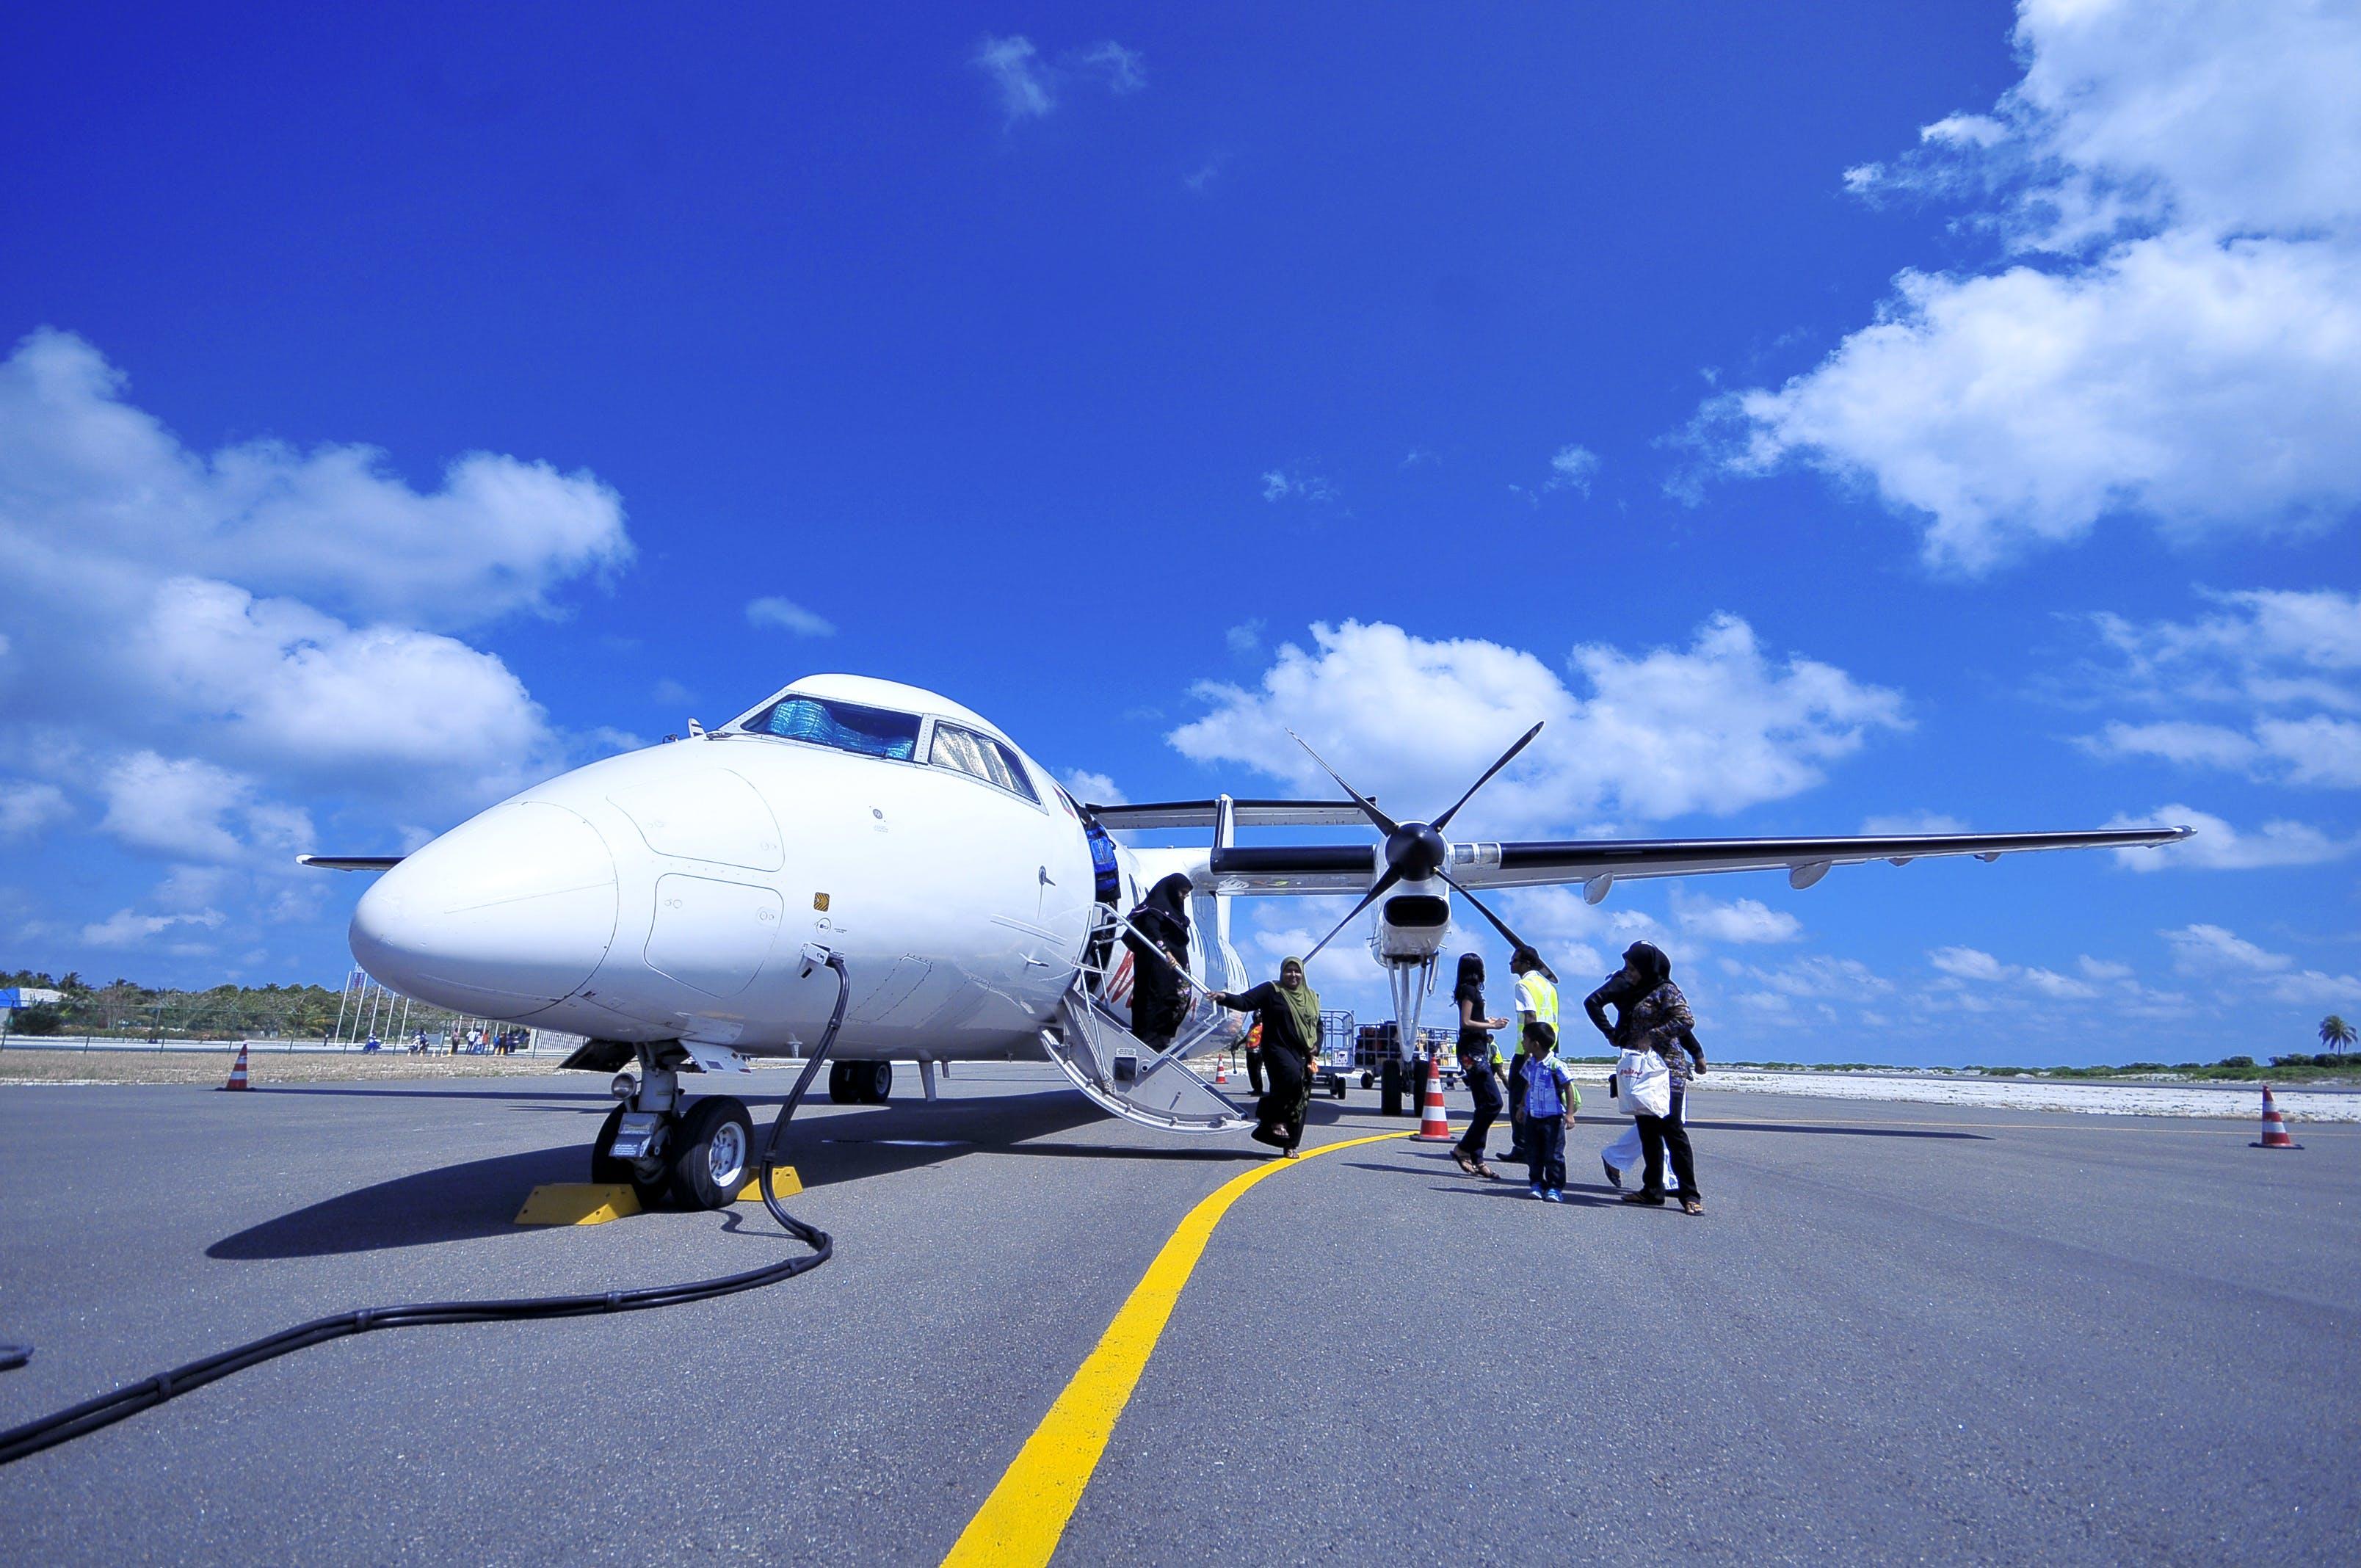 White Jet on Black Tarmac